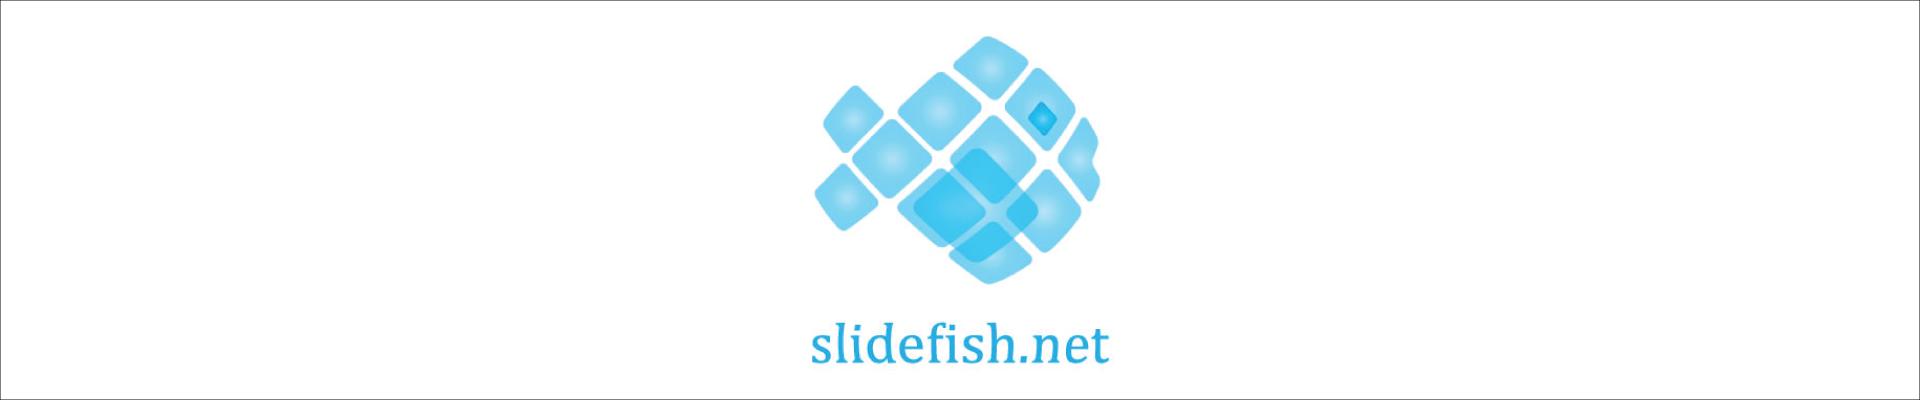 slidefish